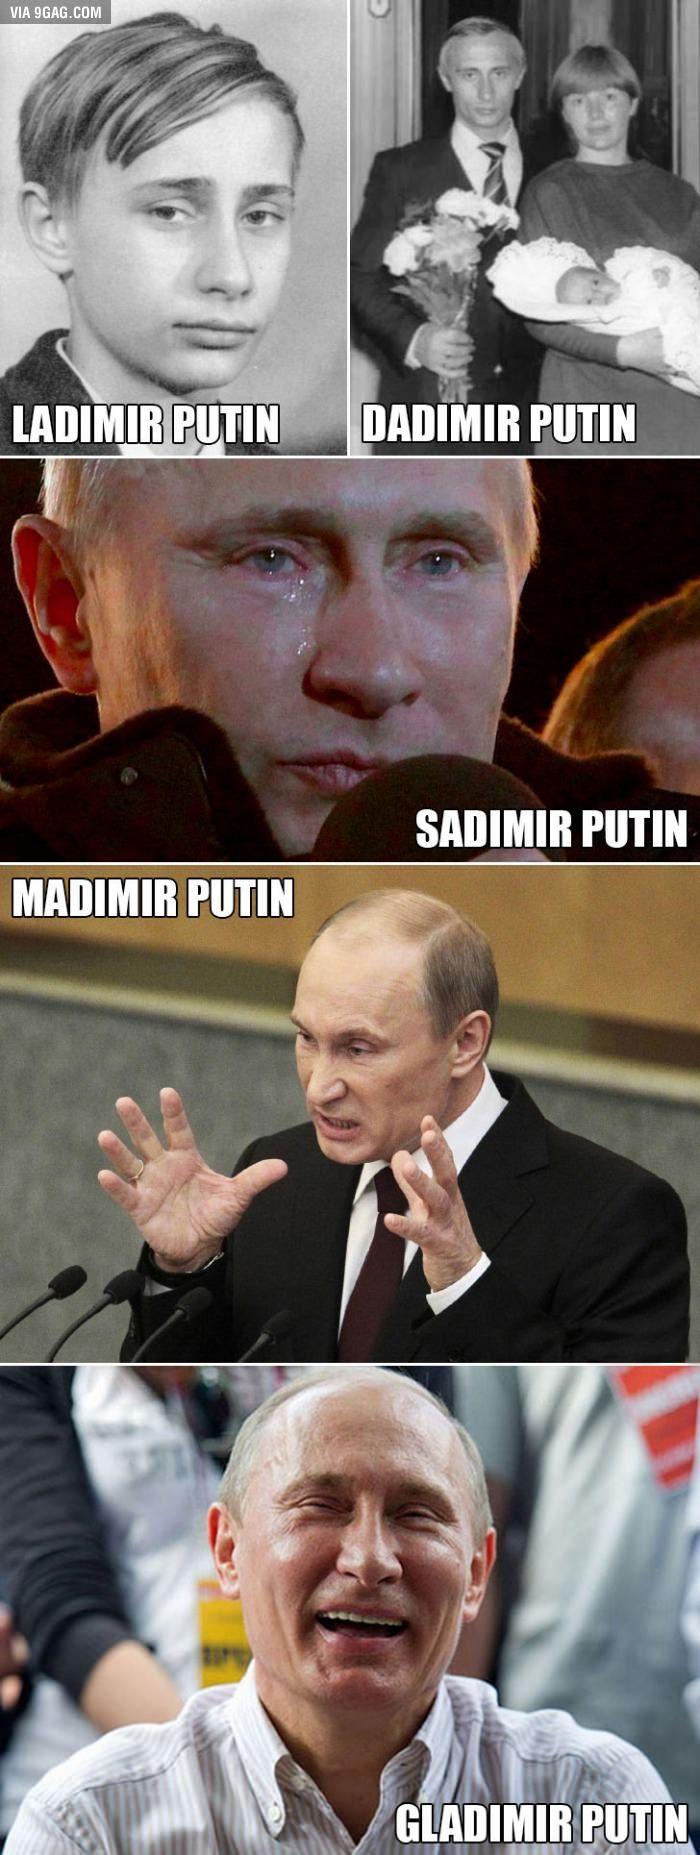 The versions of Putin